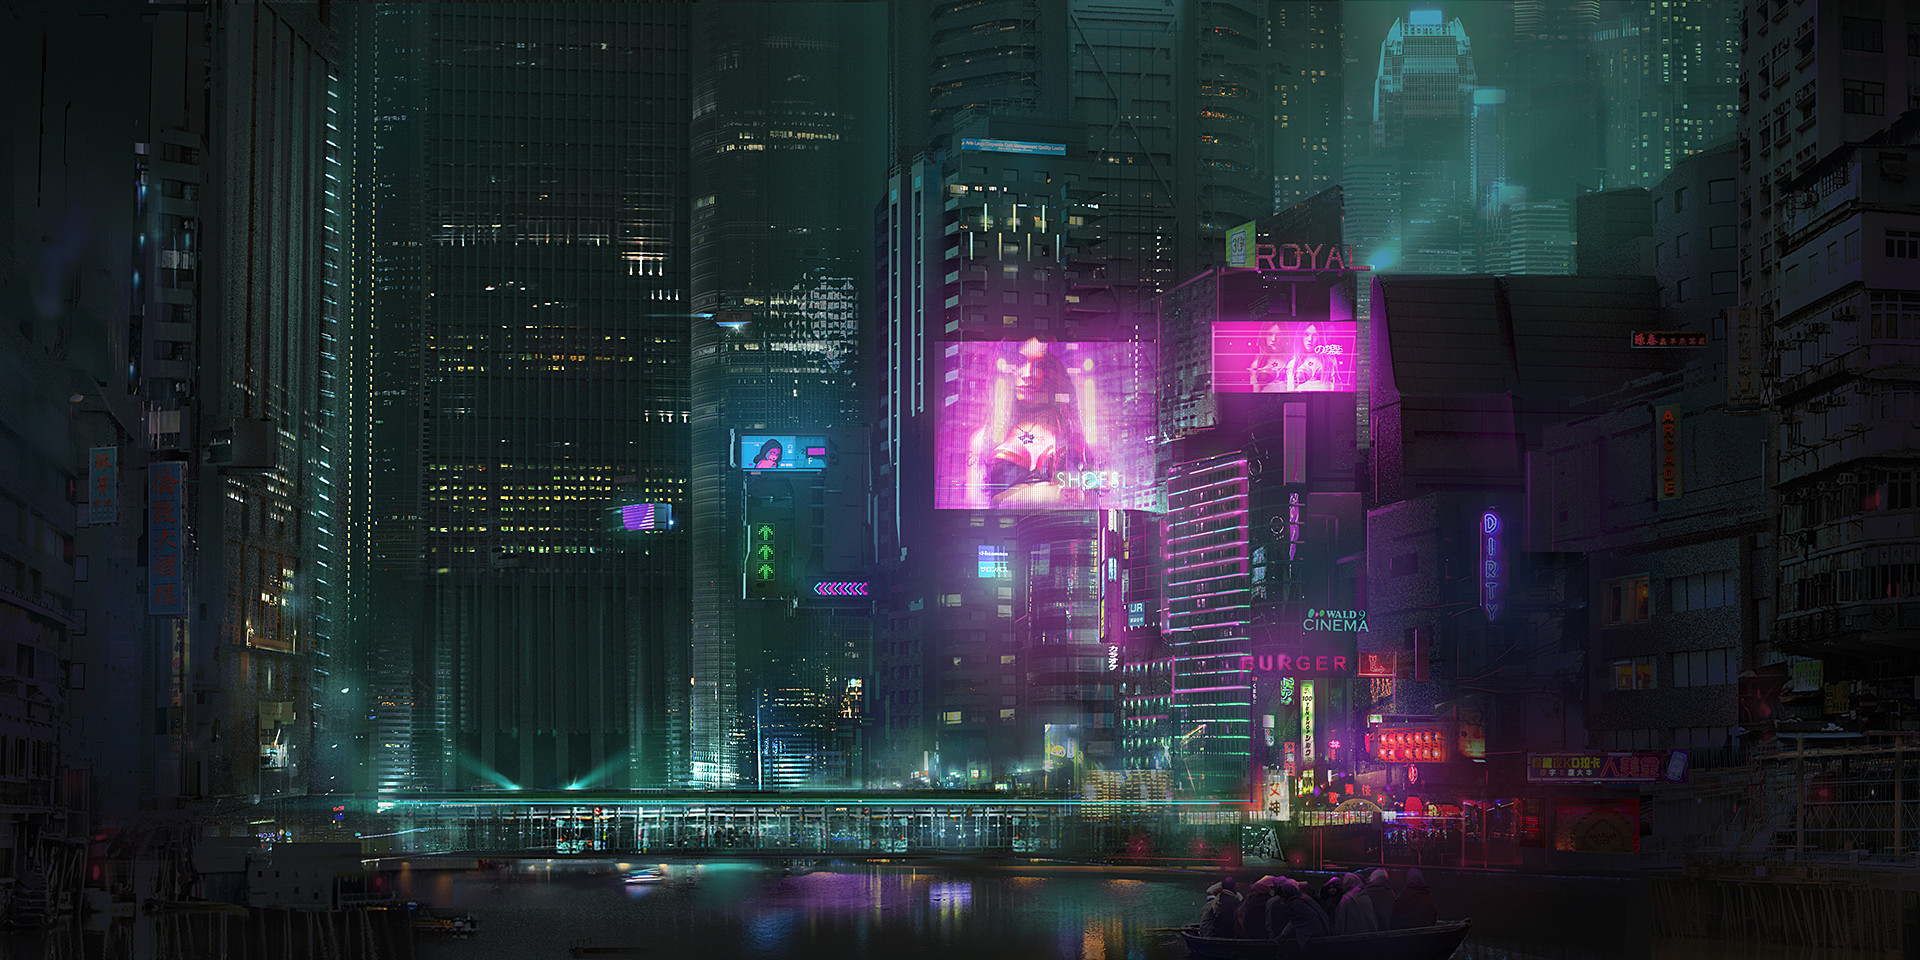 Liang mark secen city